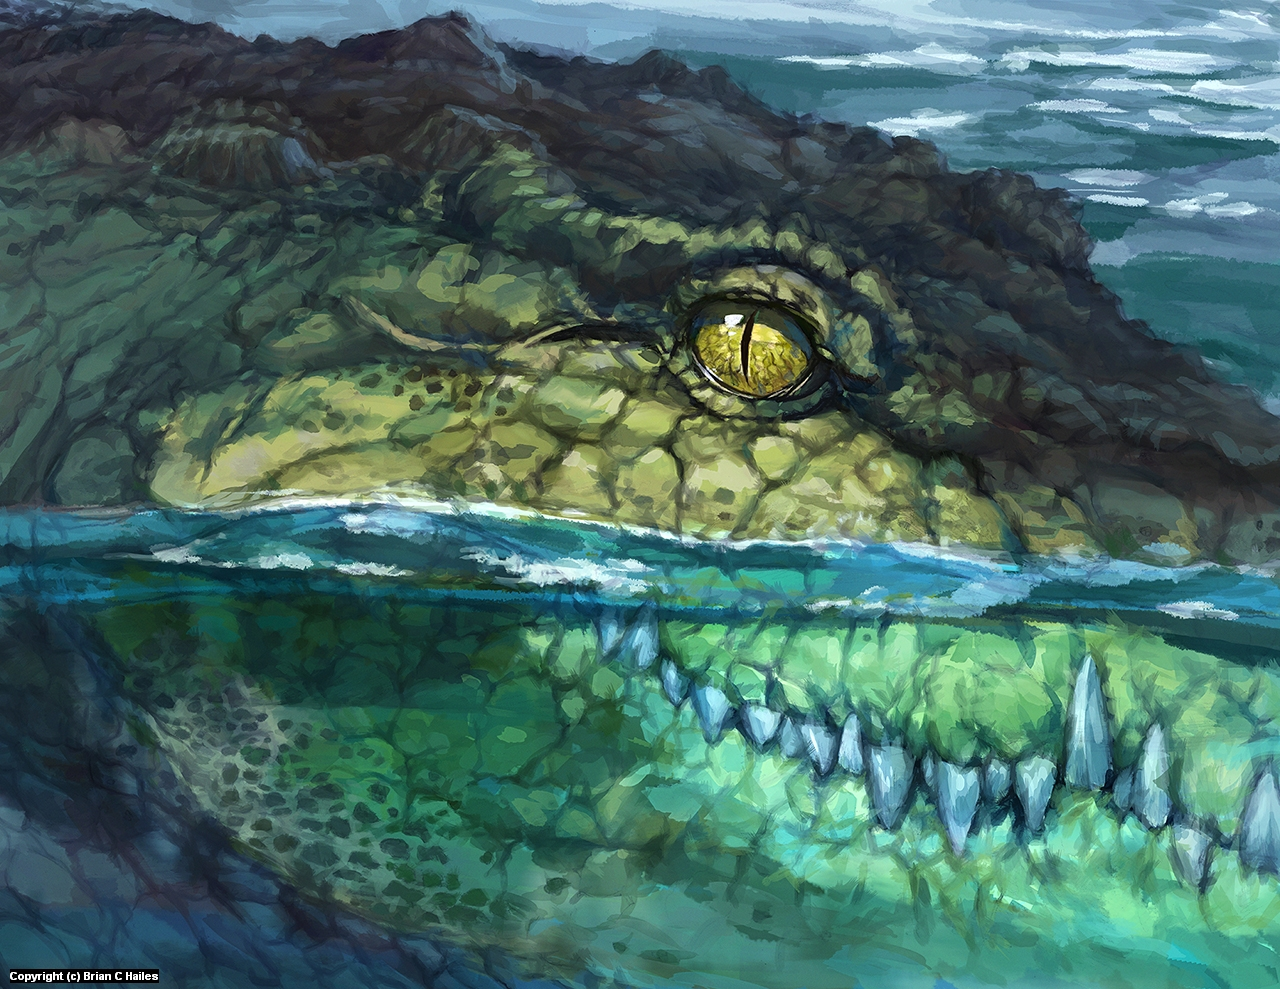 Don't Go Near the Crocodile Ponds Artwork by Brian C Hailes